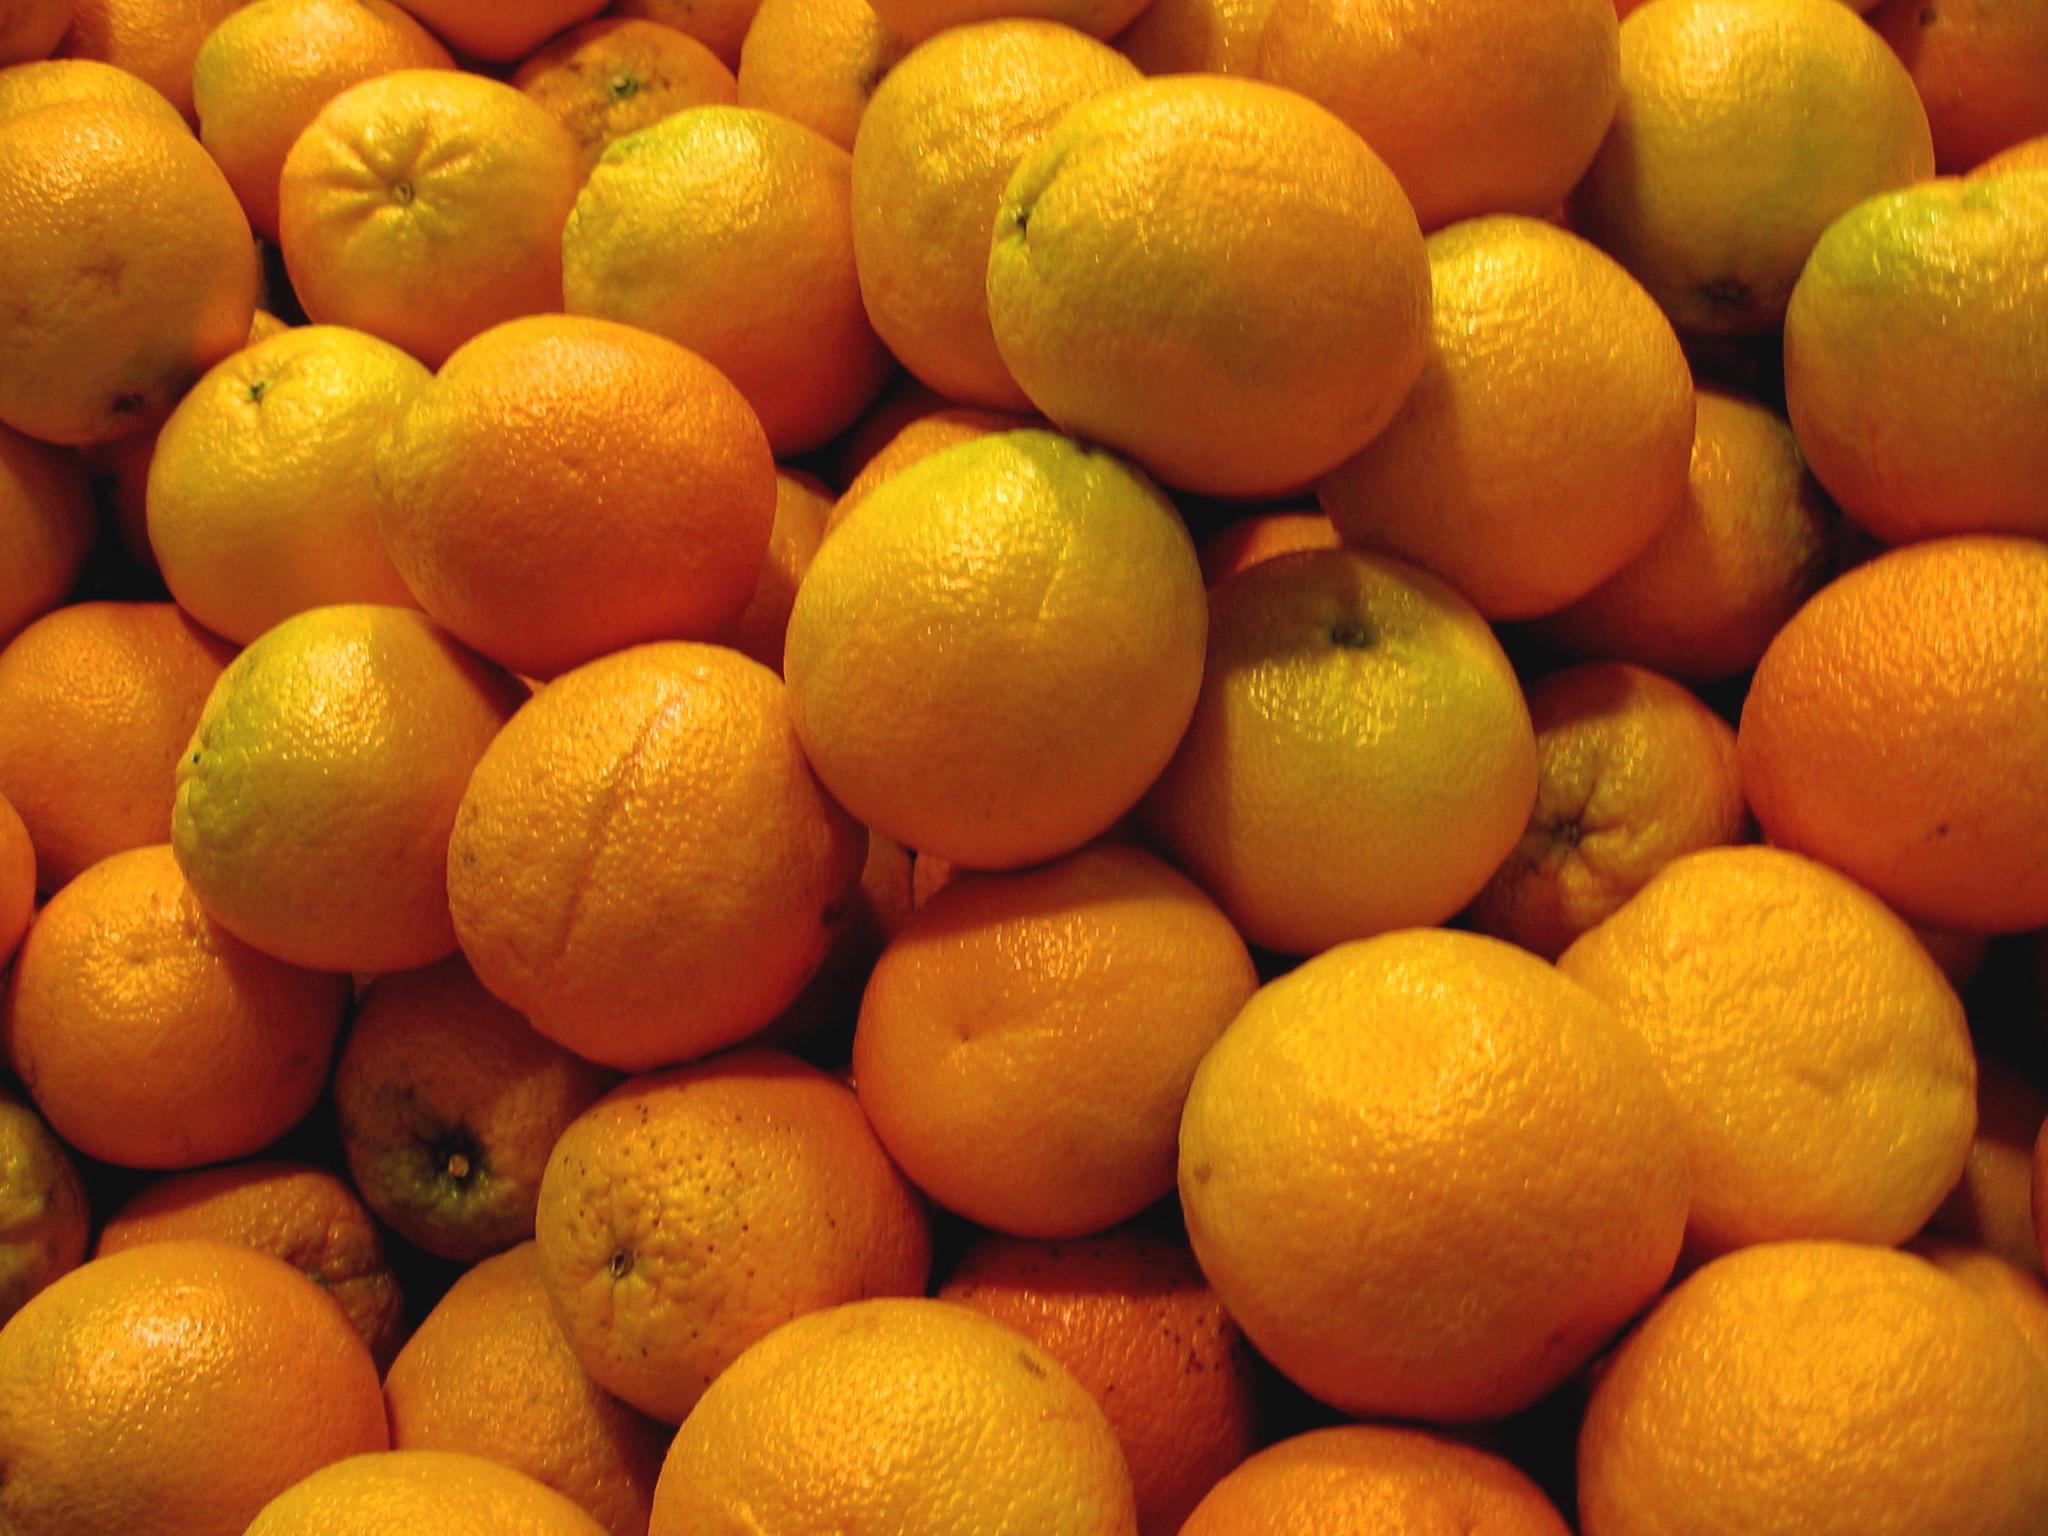 File:Pile of Oranges.jpg - Wikipedia